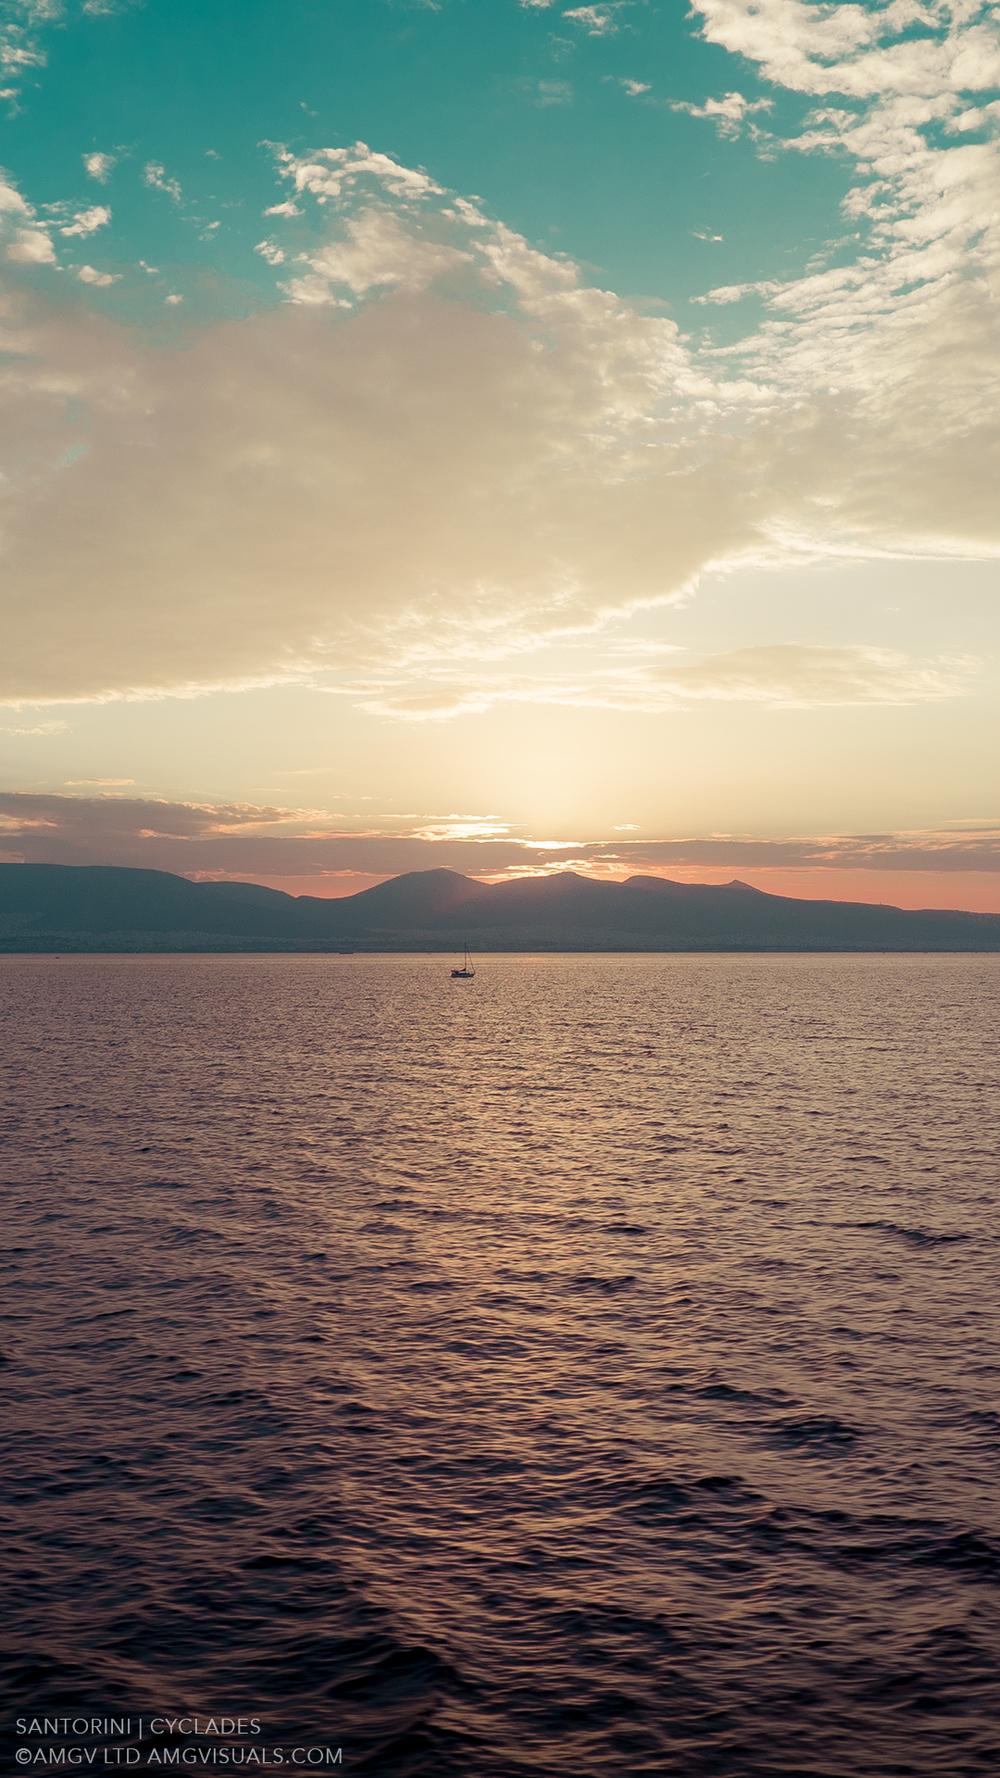 ©AMGV-LTD-Santorini+Cyclades-10.jpg